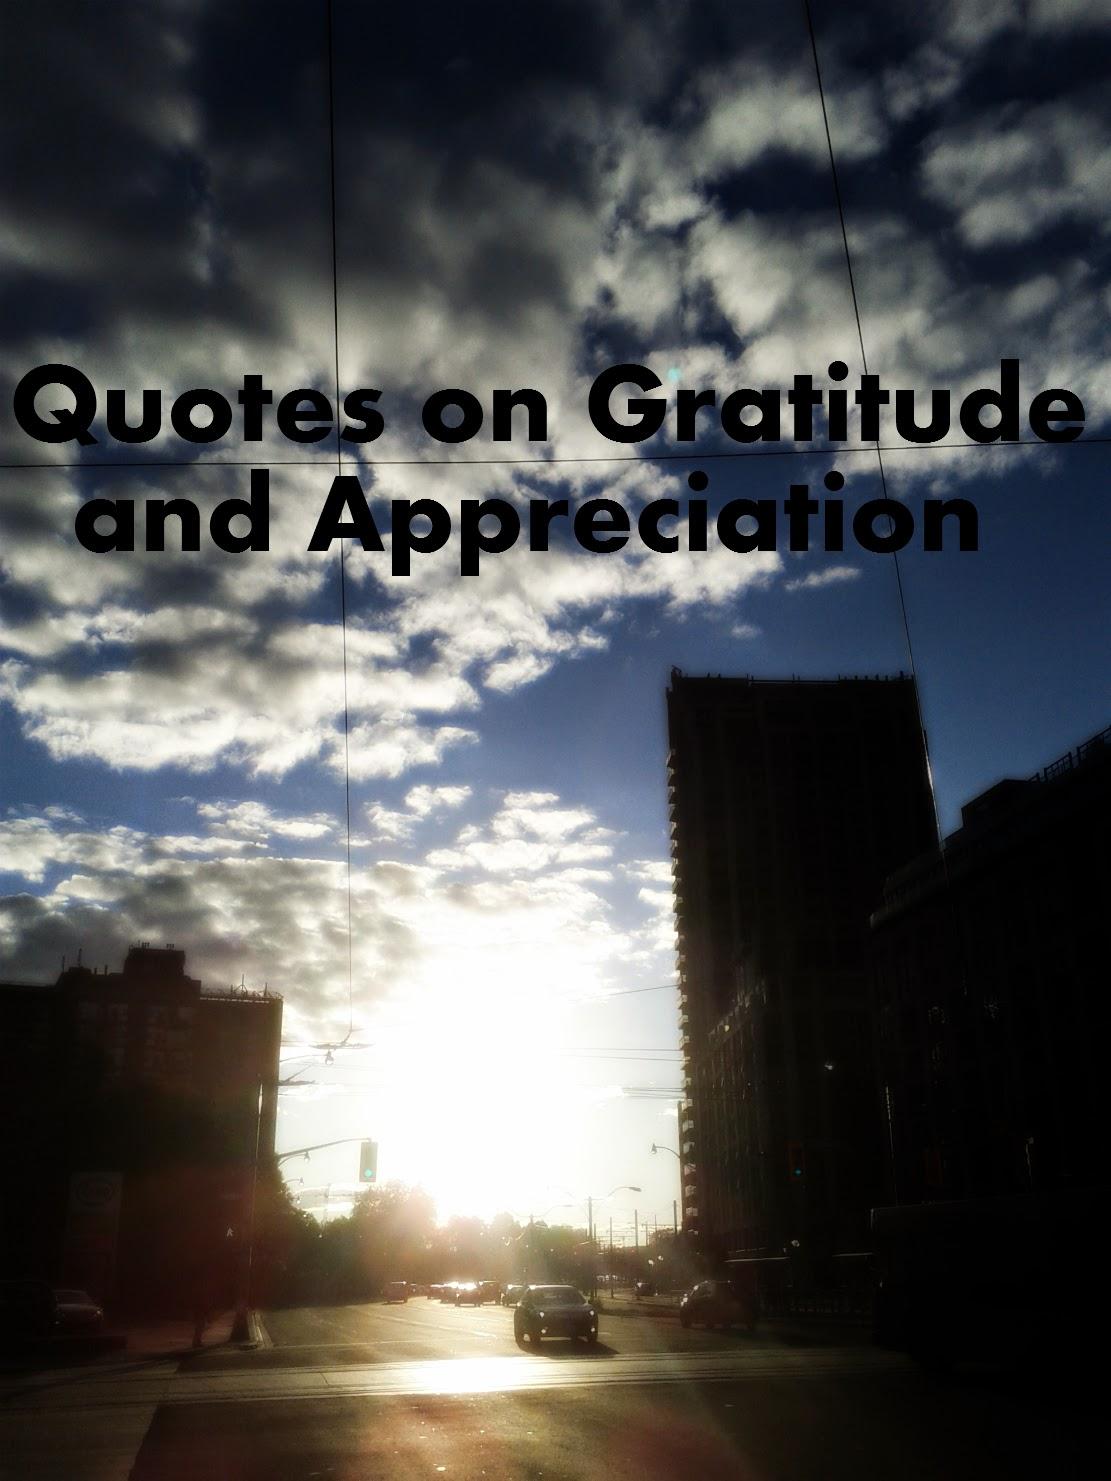 Appreciation Quotes: Appreciation Quotes For Hard Work. QuotesGram